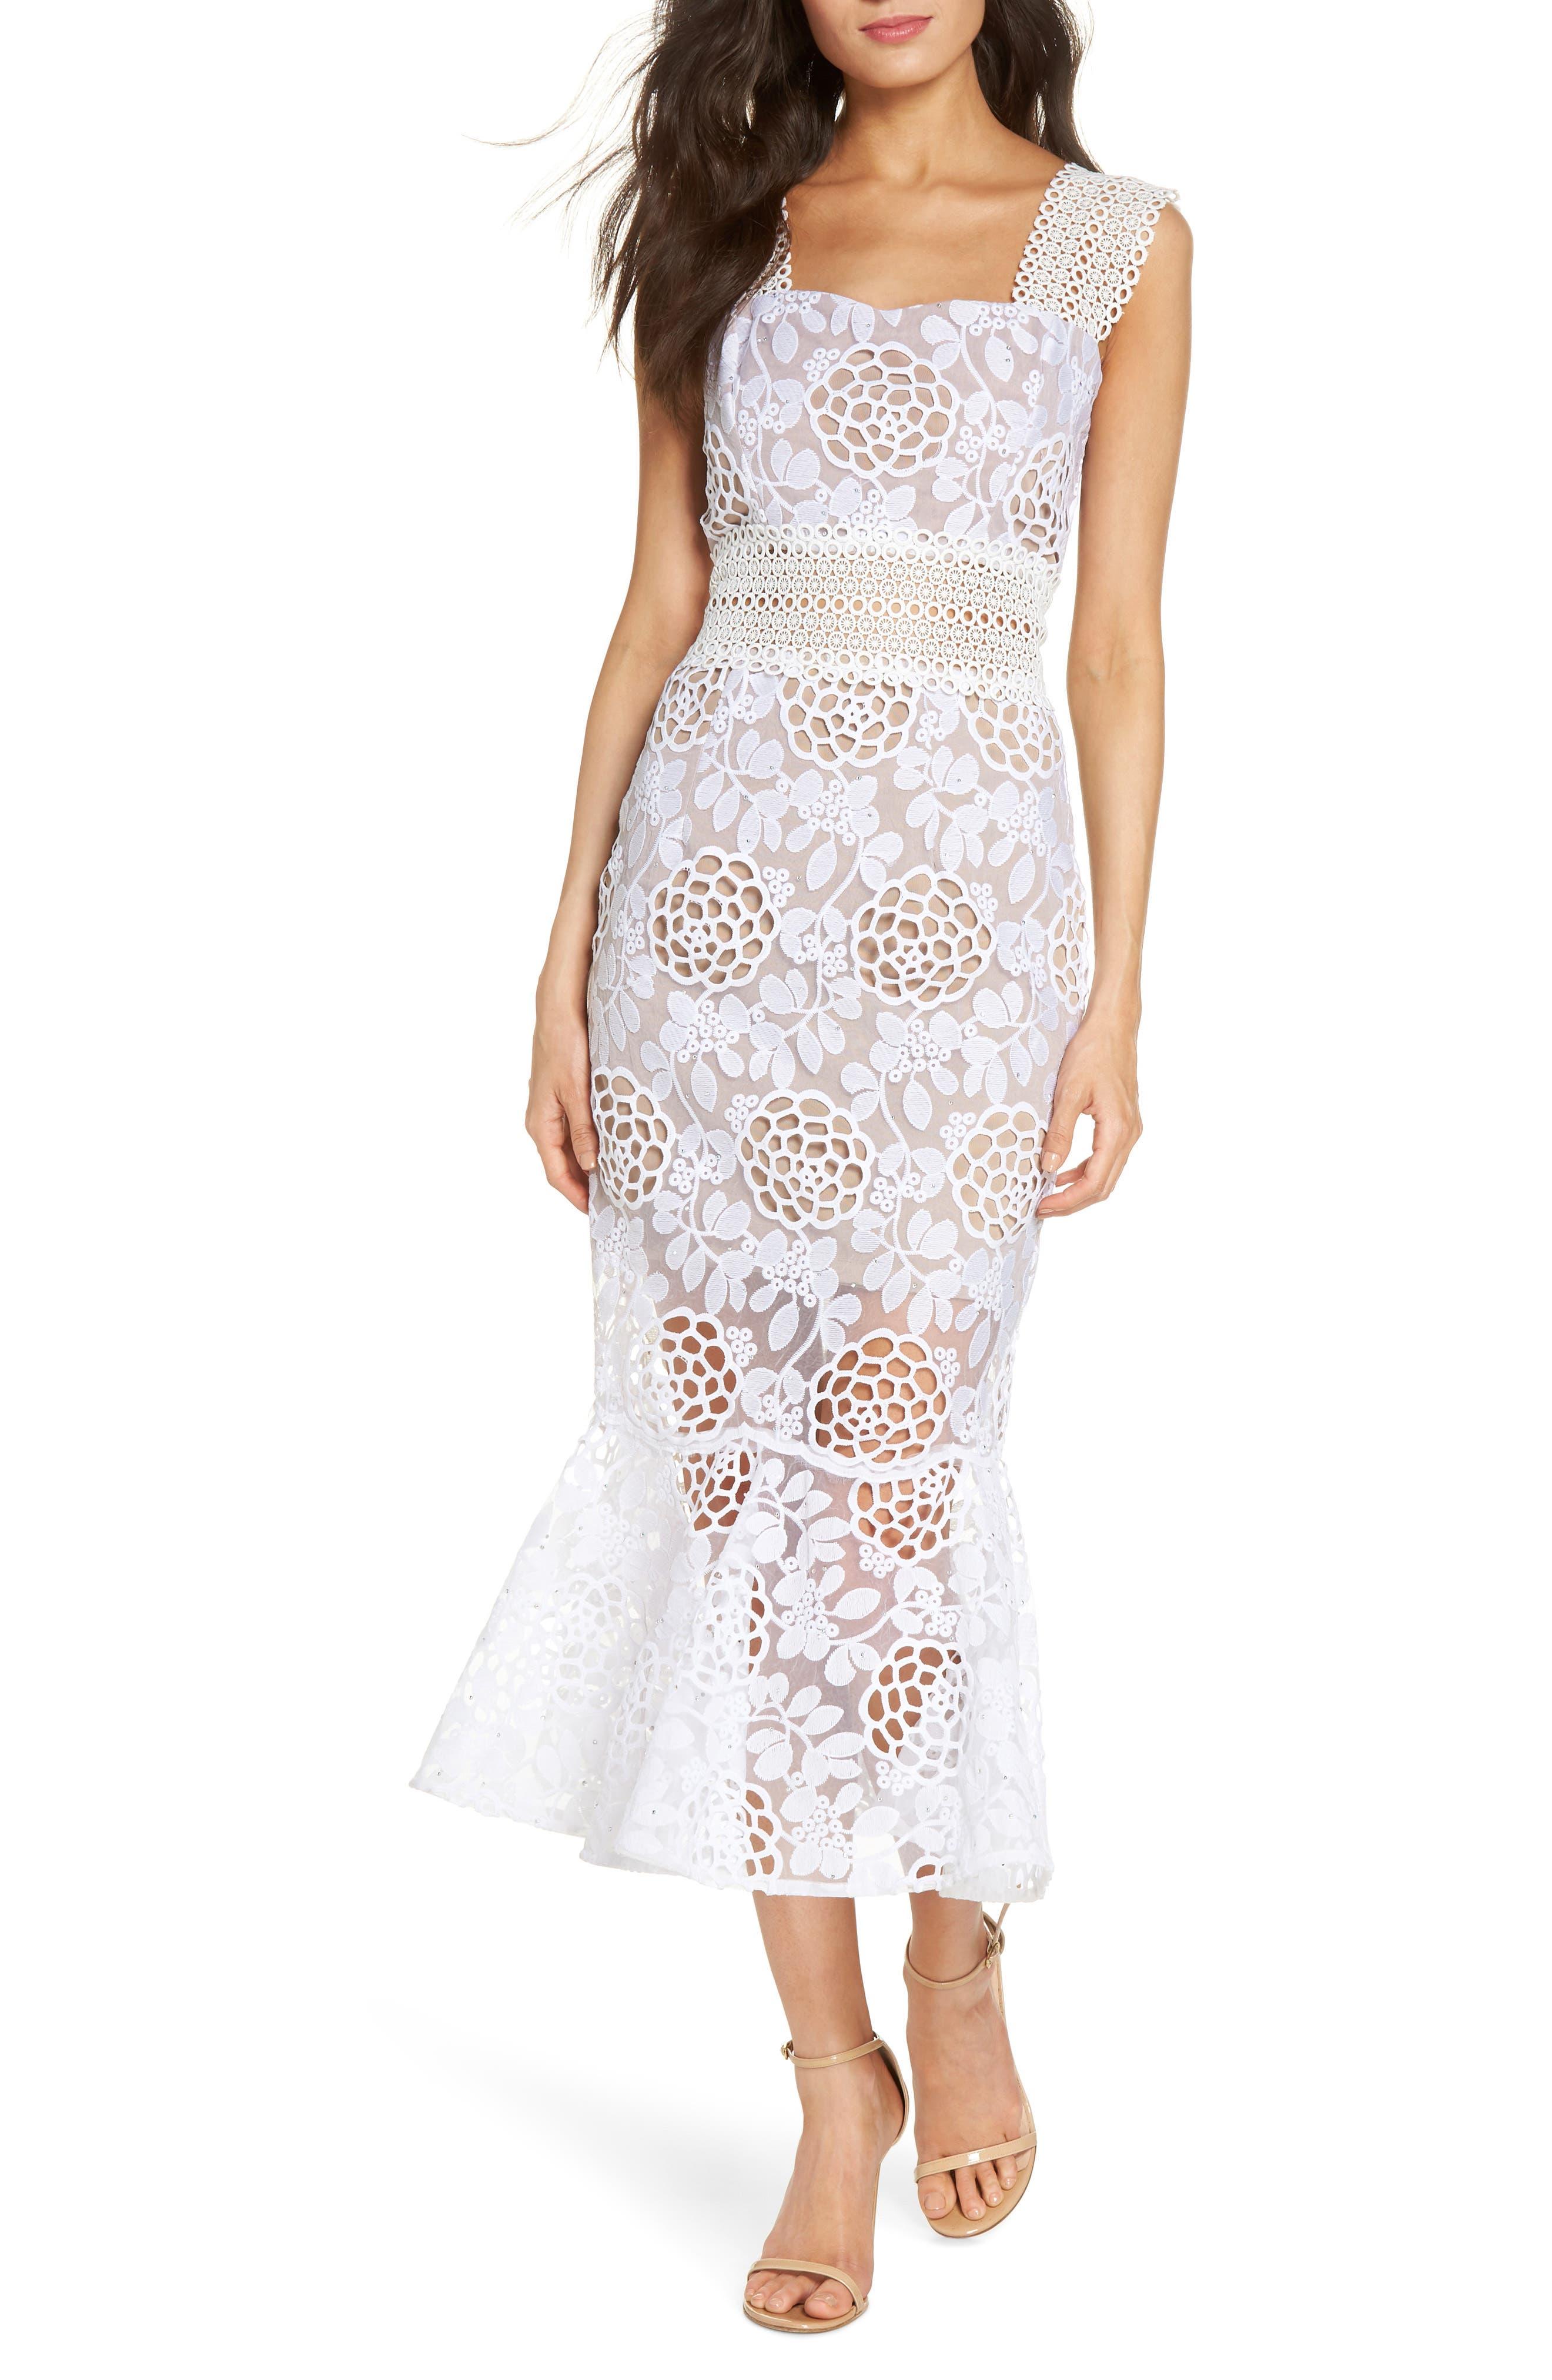 BRONX AND BANCO Capri Floral Lace Midi Dress, Main, color, 100